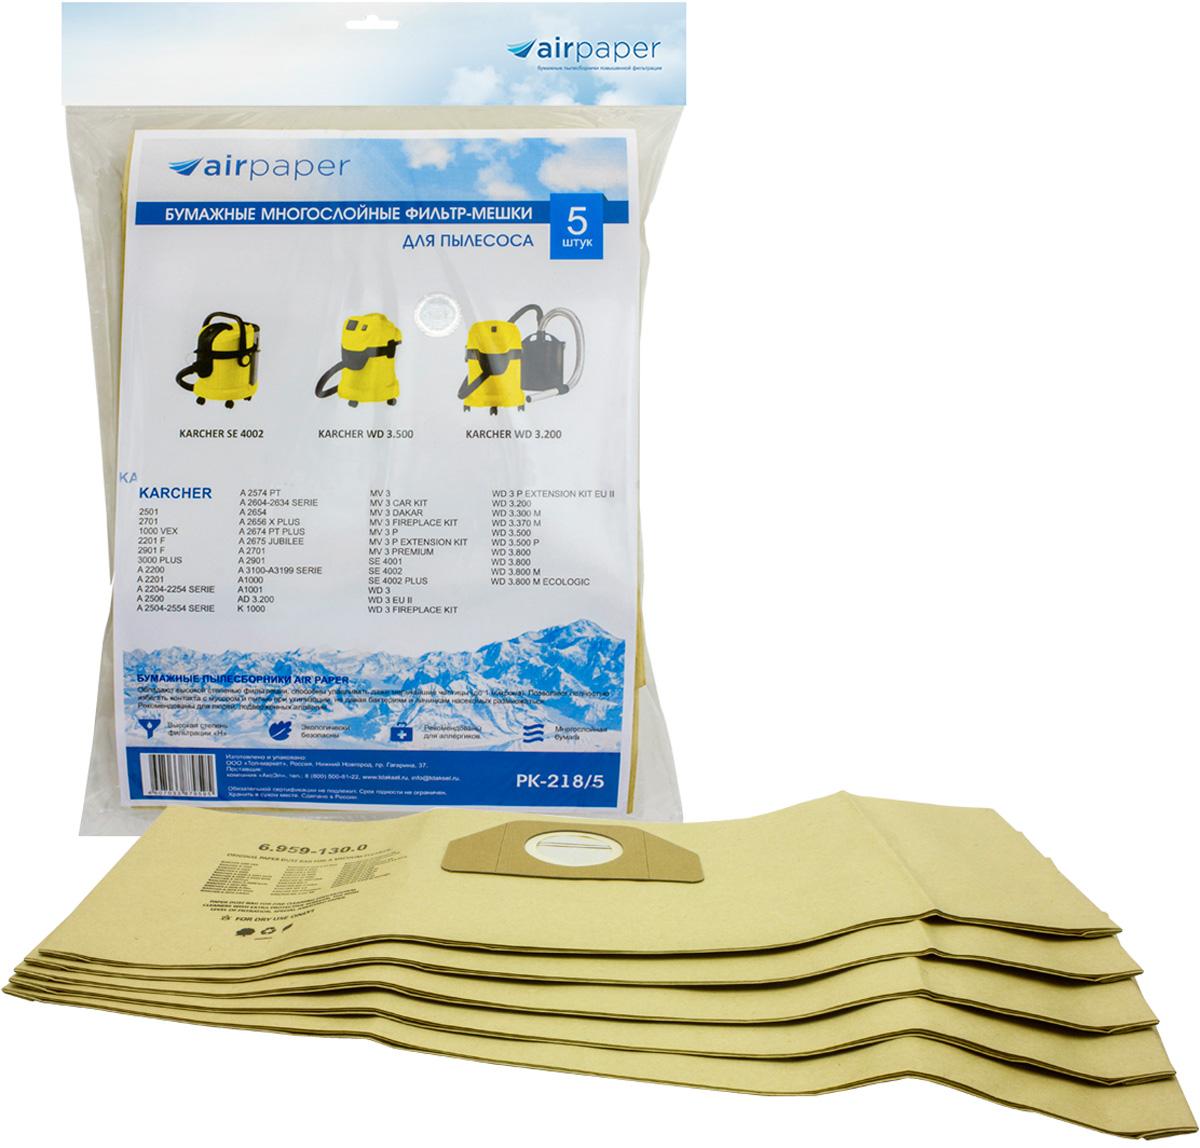 AIR Paper РК-218/5 пылесборники для пылесоса KARCHER, 5 шт air paper рк 218 5 пылесборники для пылесоса karcher 5 шт